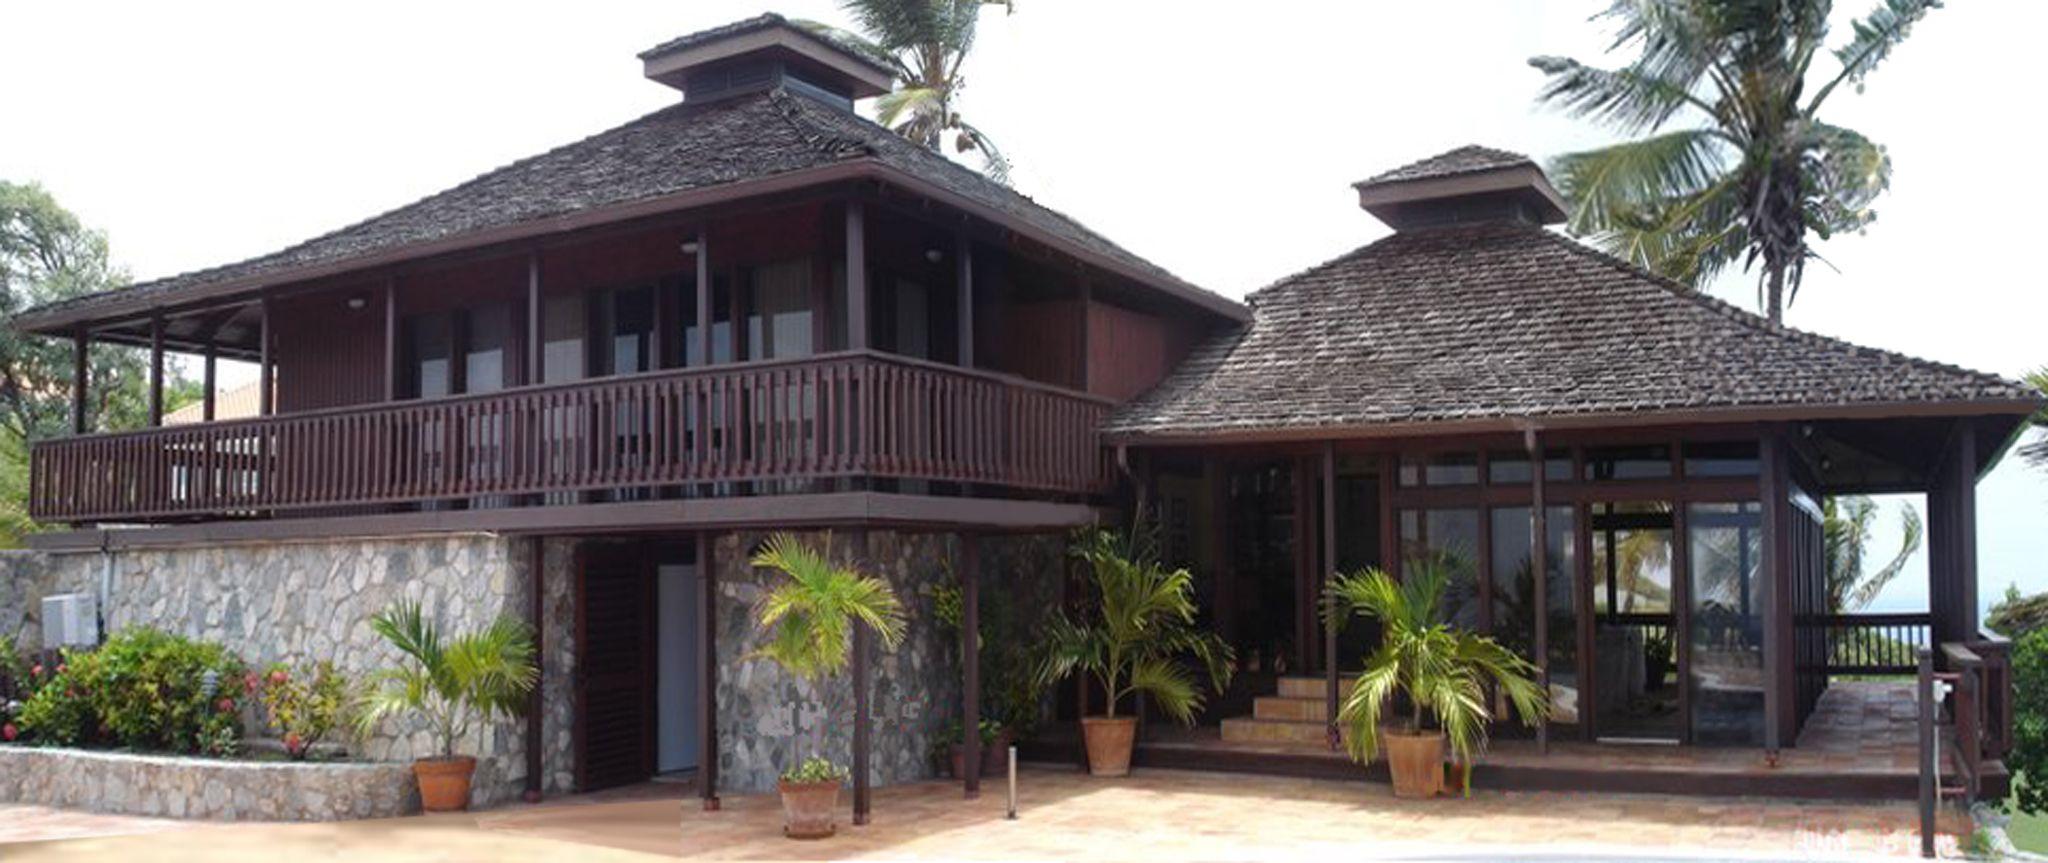 Prefab house design philippines home